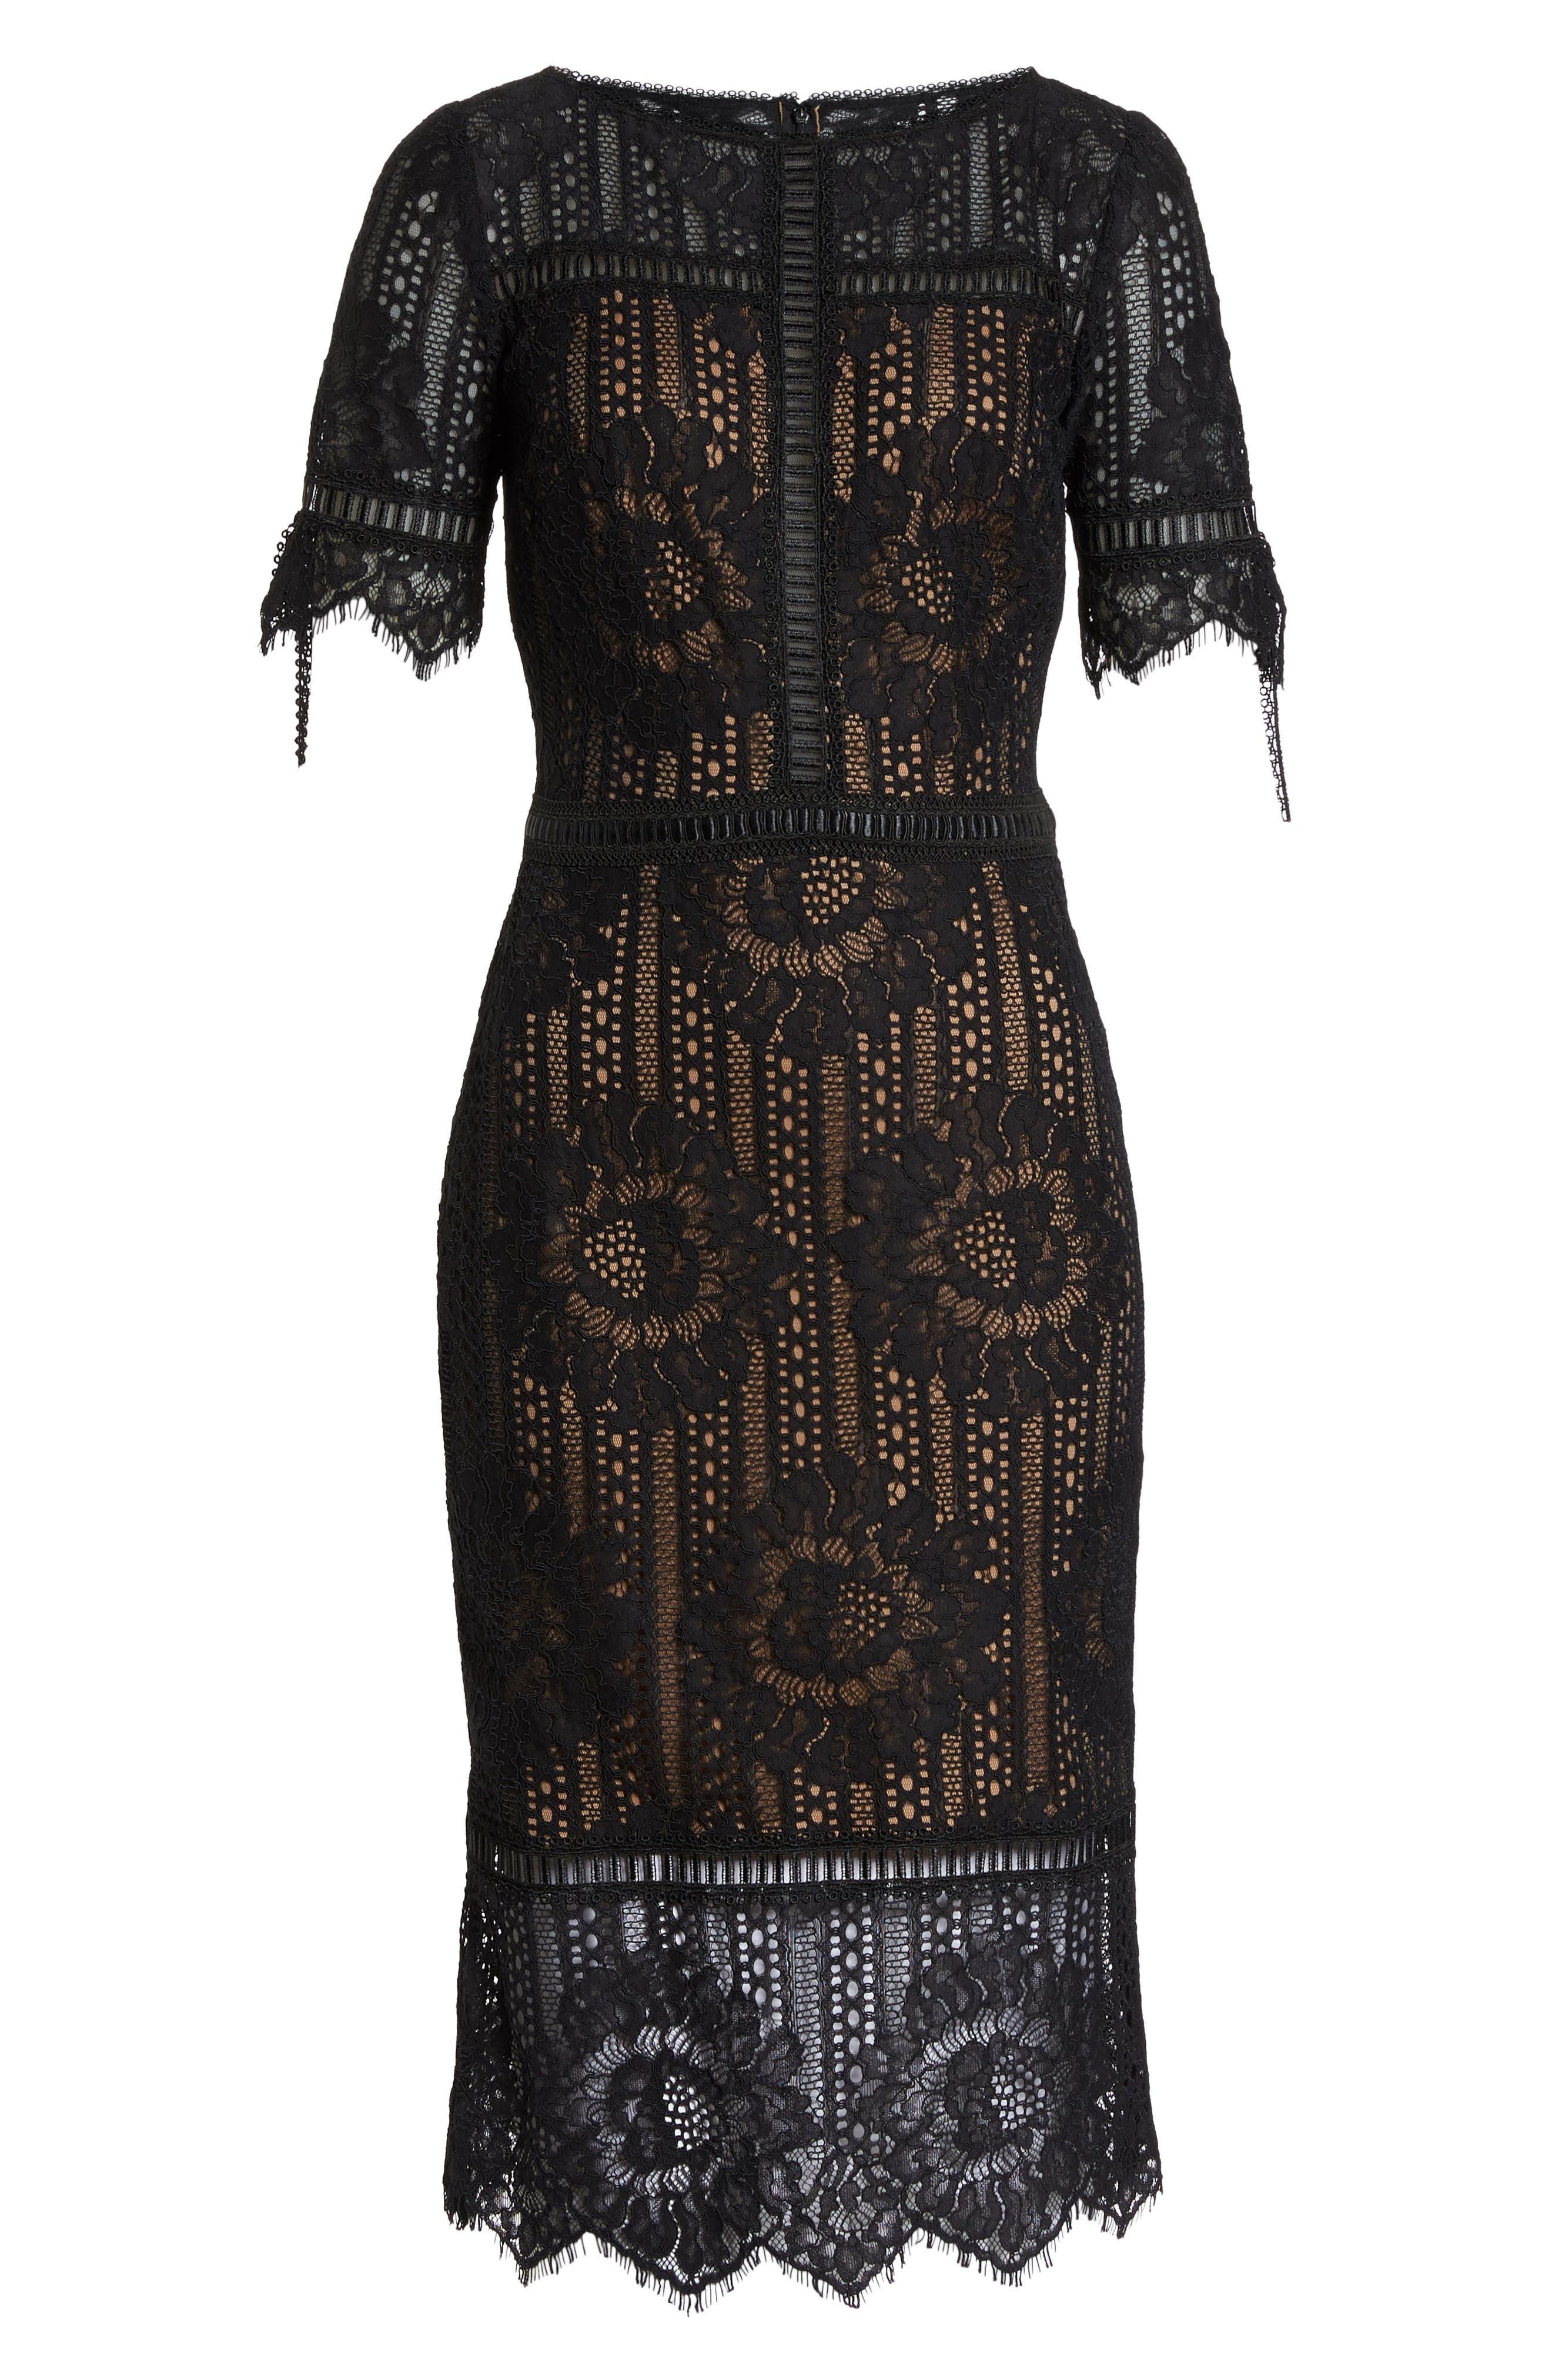 Tie Sleeve Lace Dress,                             Alternate thumbnail 6, color,                             Black/ Nude